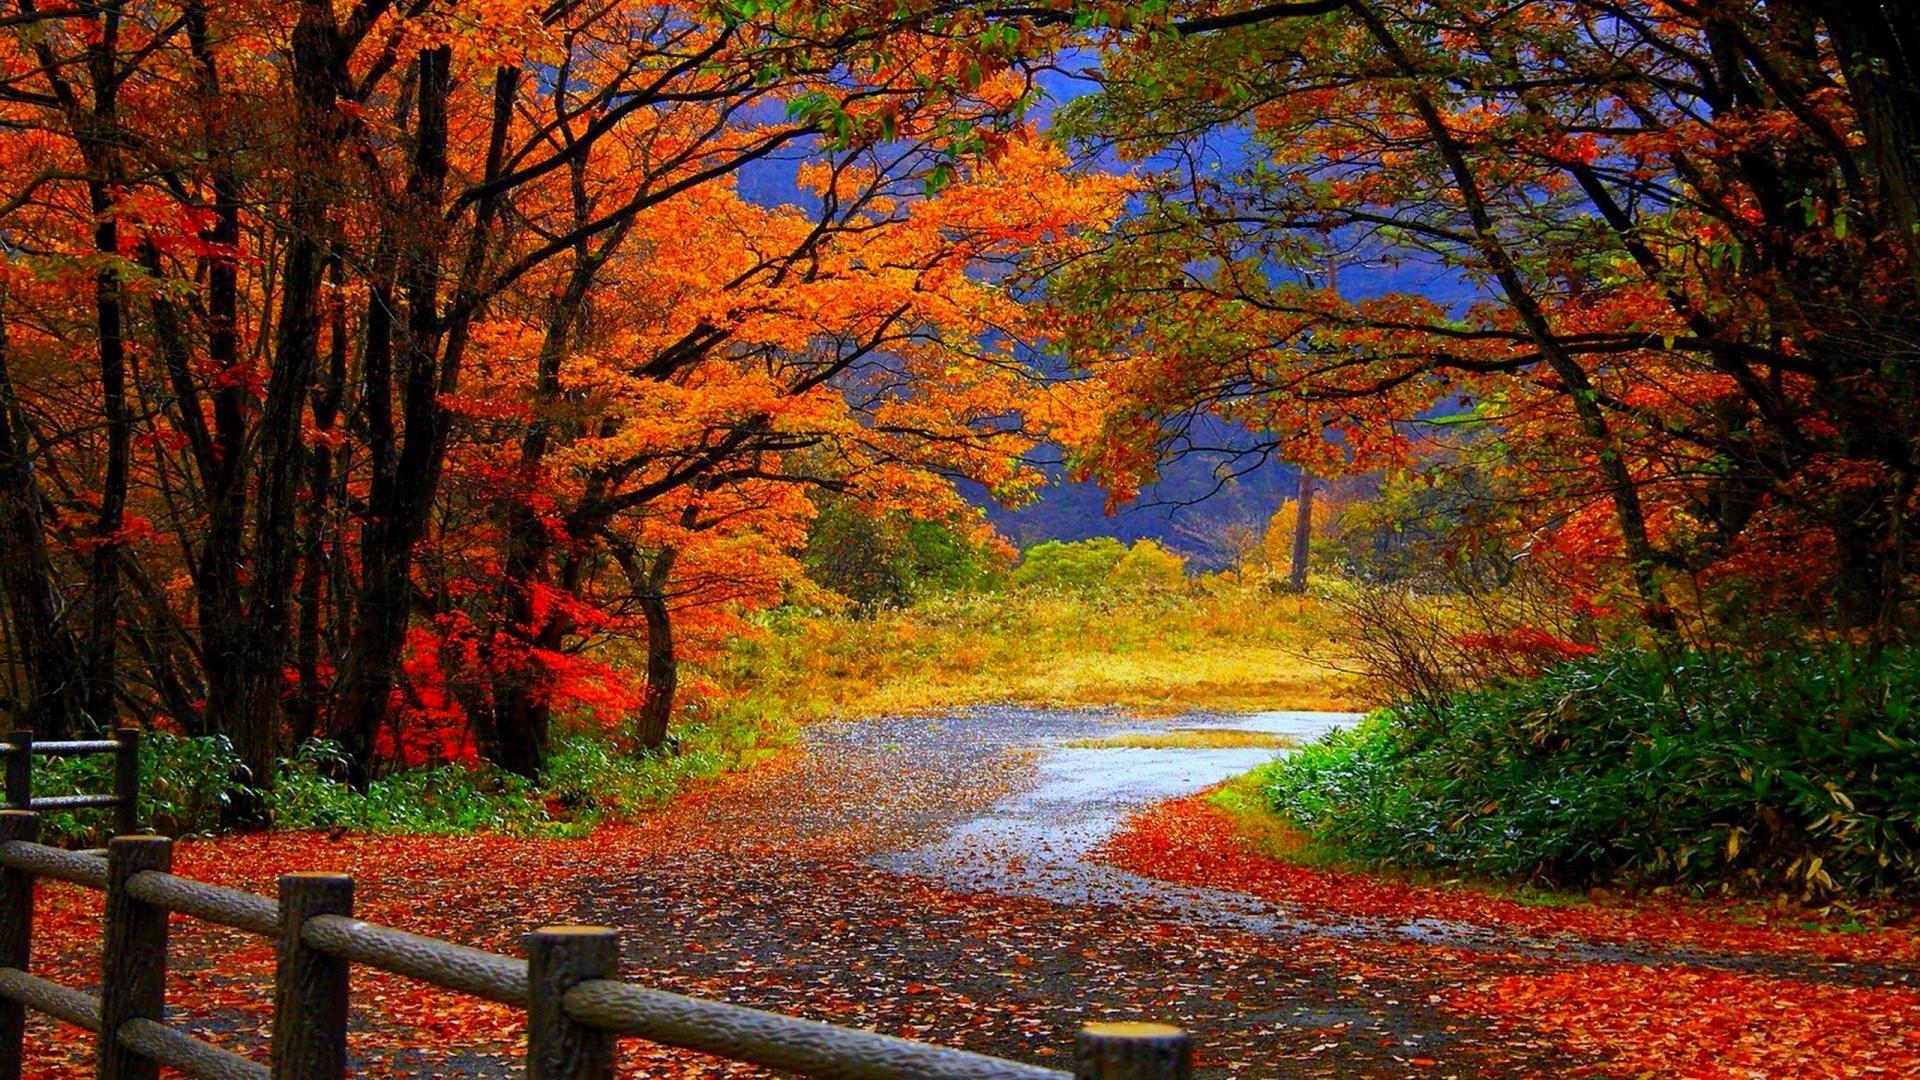 wallpaper.wiki-Download-Fall-Desktop-Images-PIC-WPE008802